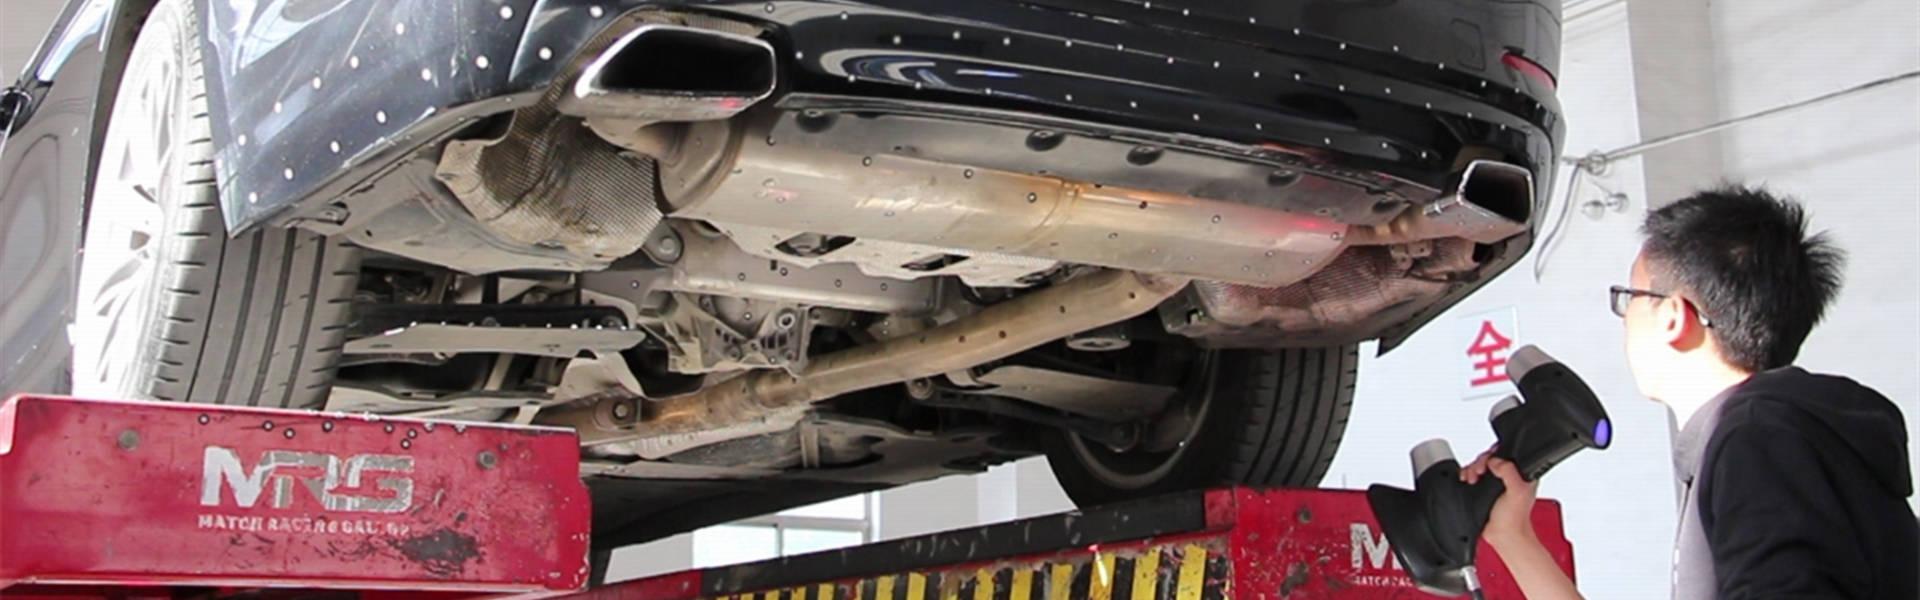 3D扫描仪突破汽车排气系统改装传统工艺